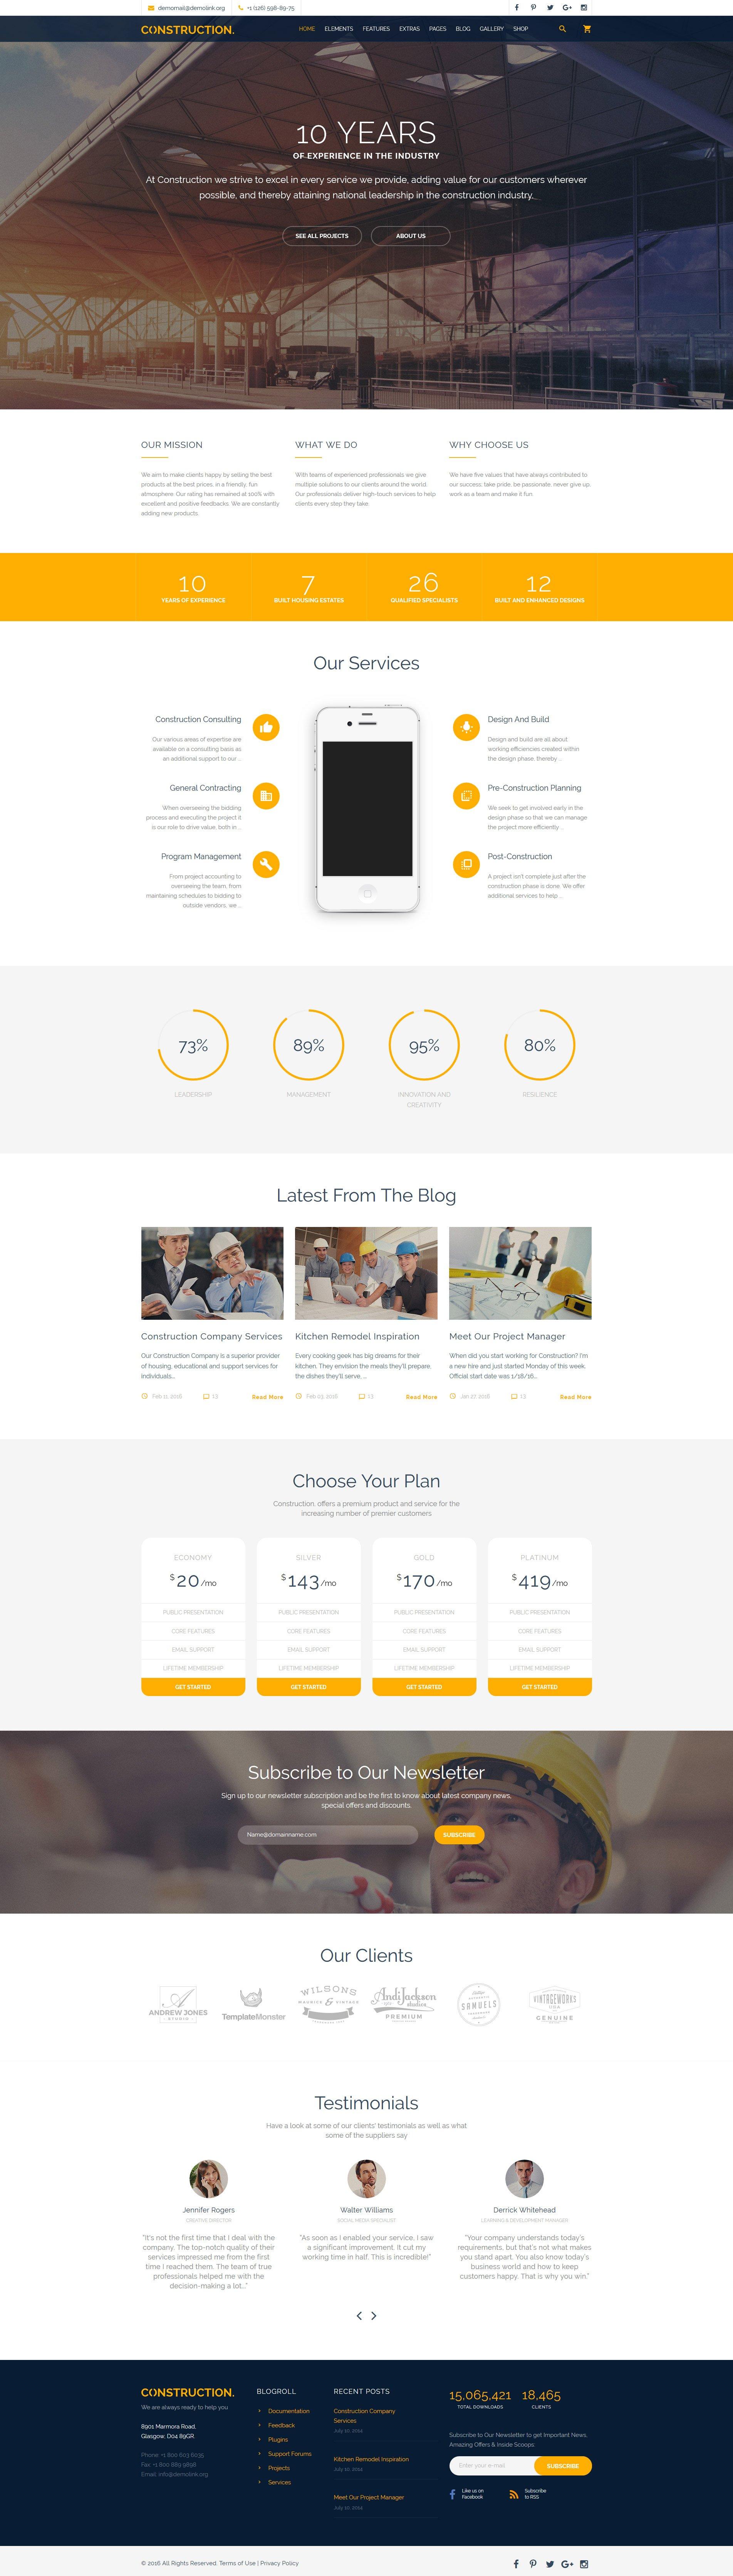 """Construction Multipurpose Website Template"" 响应式网页模板 #58533"